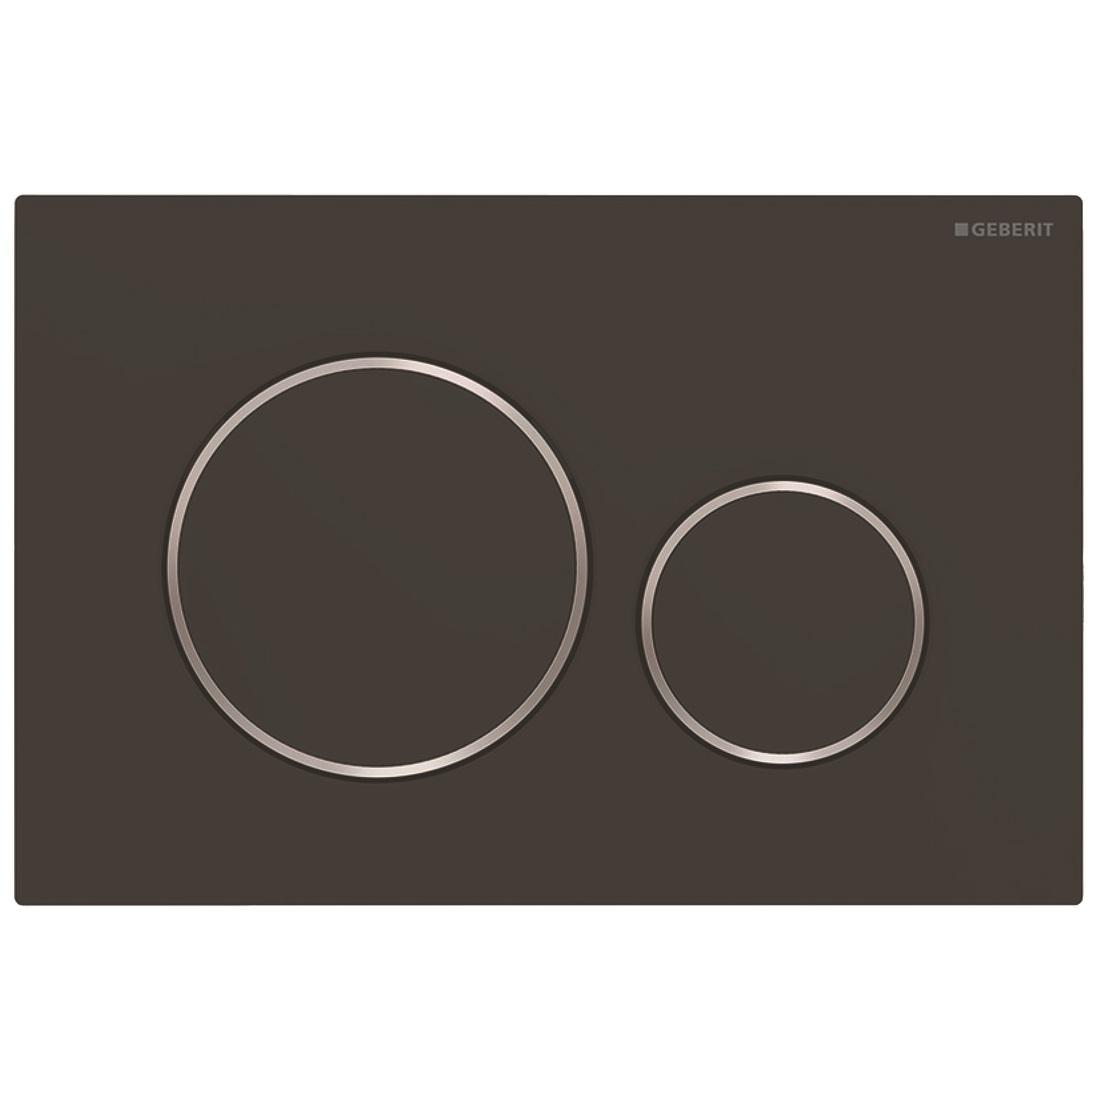 Clapeta actionare Geberit Sigma20 EasyToClean negru mat imagine